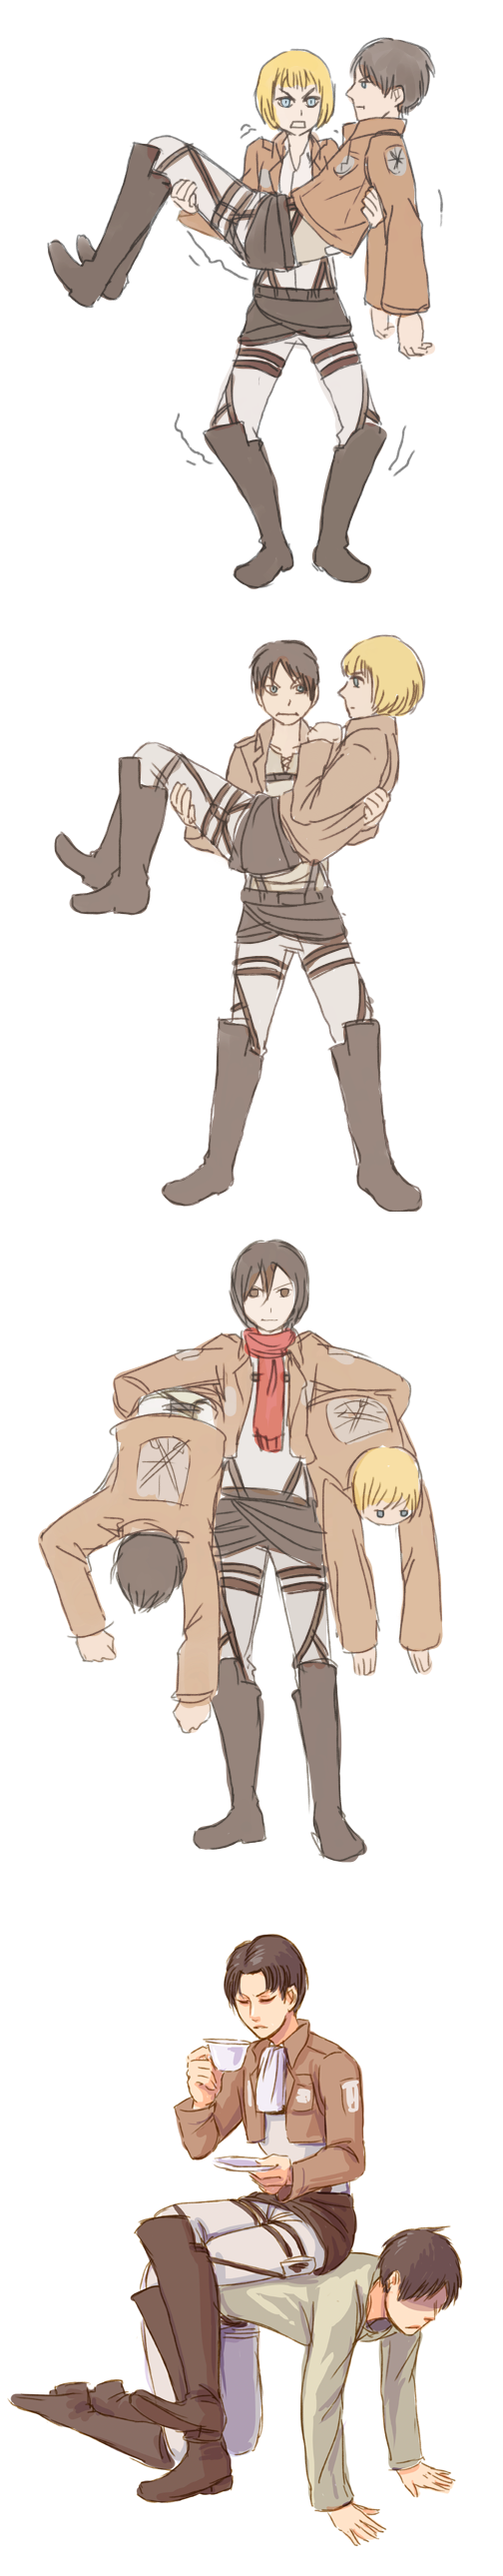 Attack on Titan ~ Strength training by oranges-lemons  Armin's like